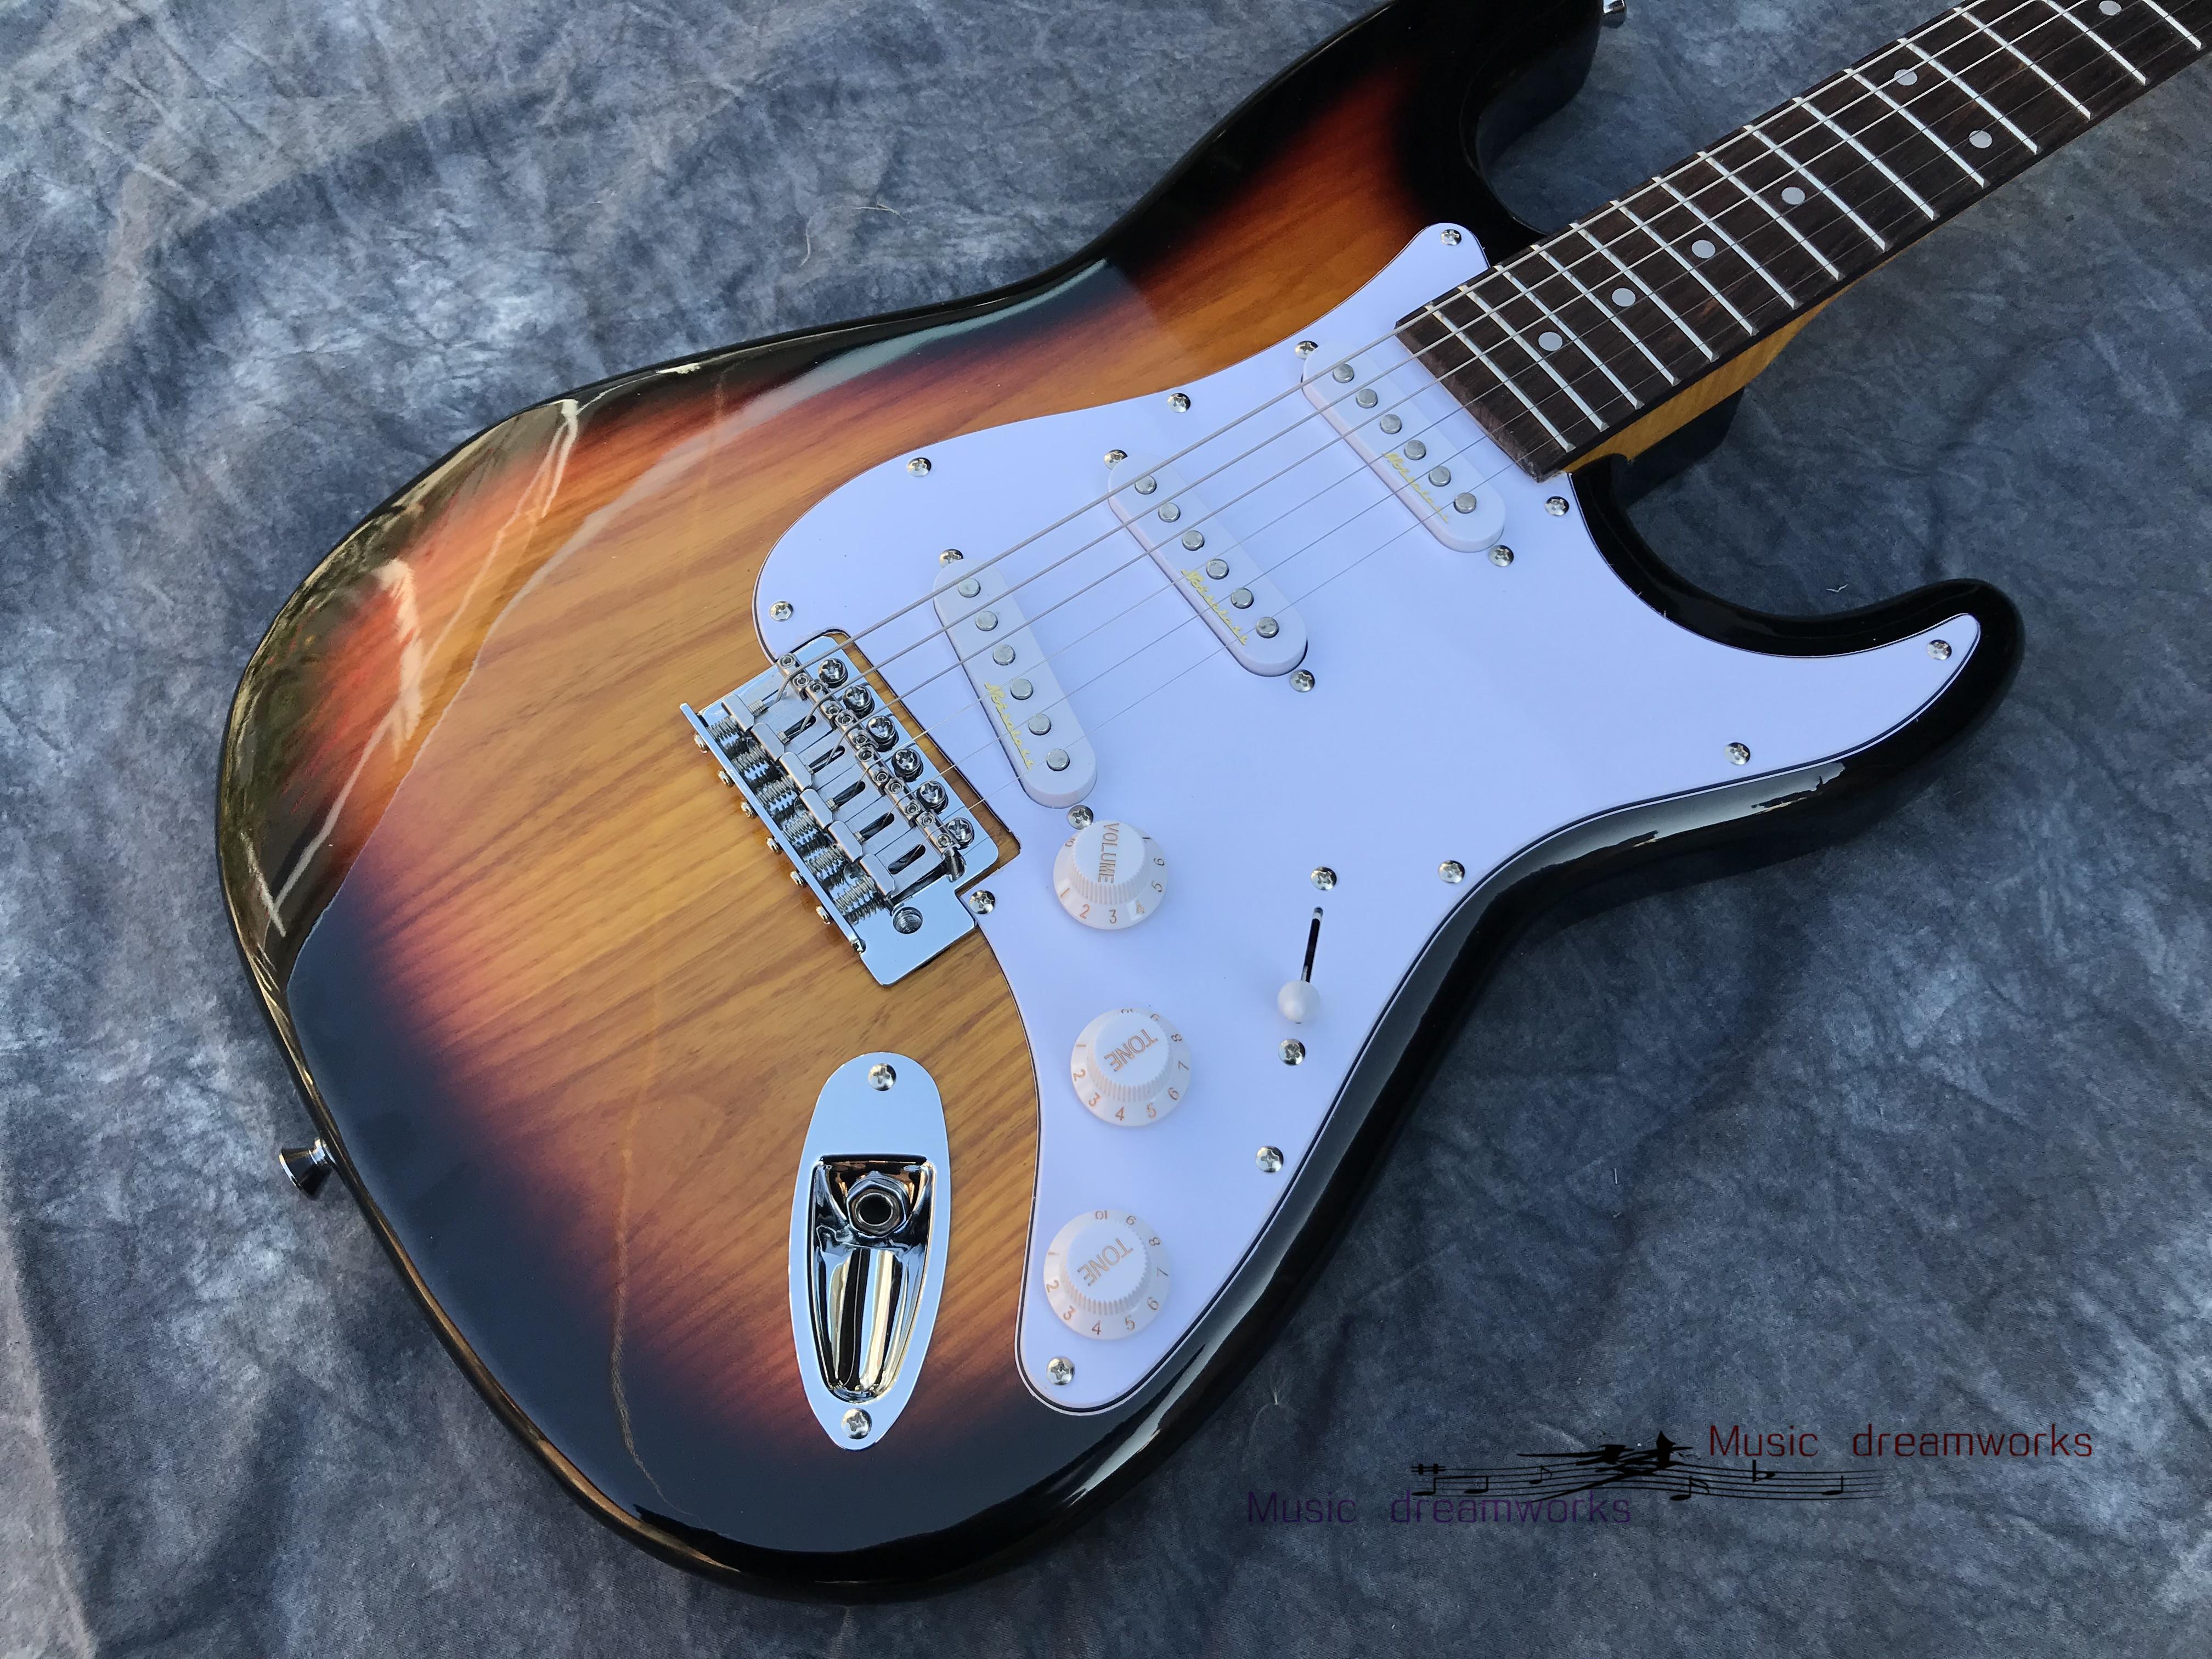 Çin Elektro Gitar Gümrük Mağazaları S T Gitar Alder Vücut, Alev Akçaağaç Boyun